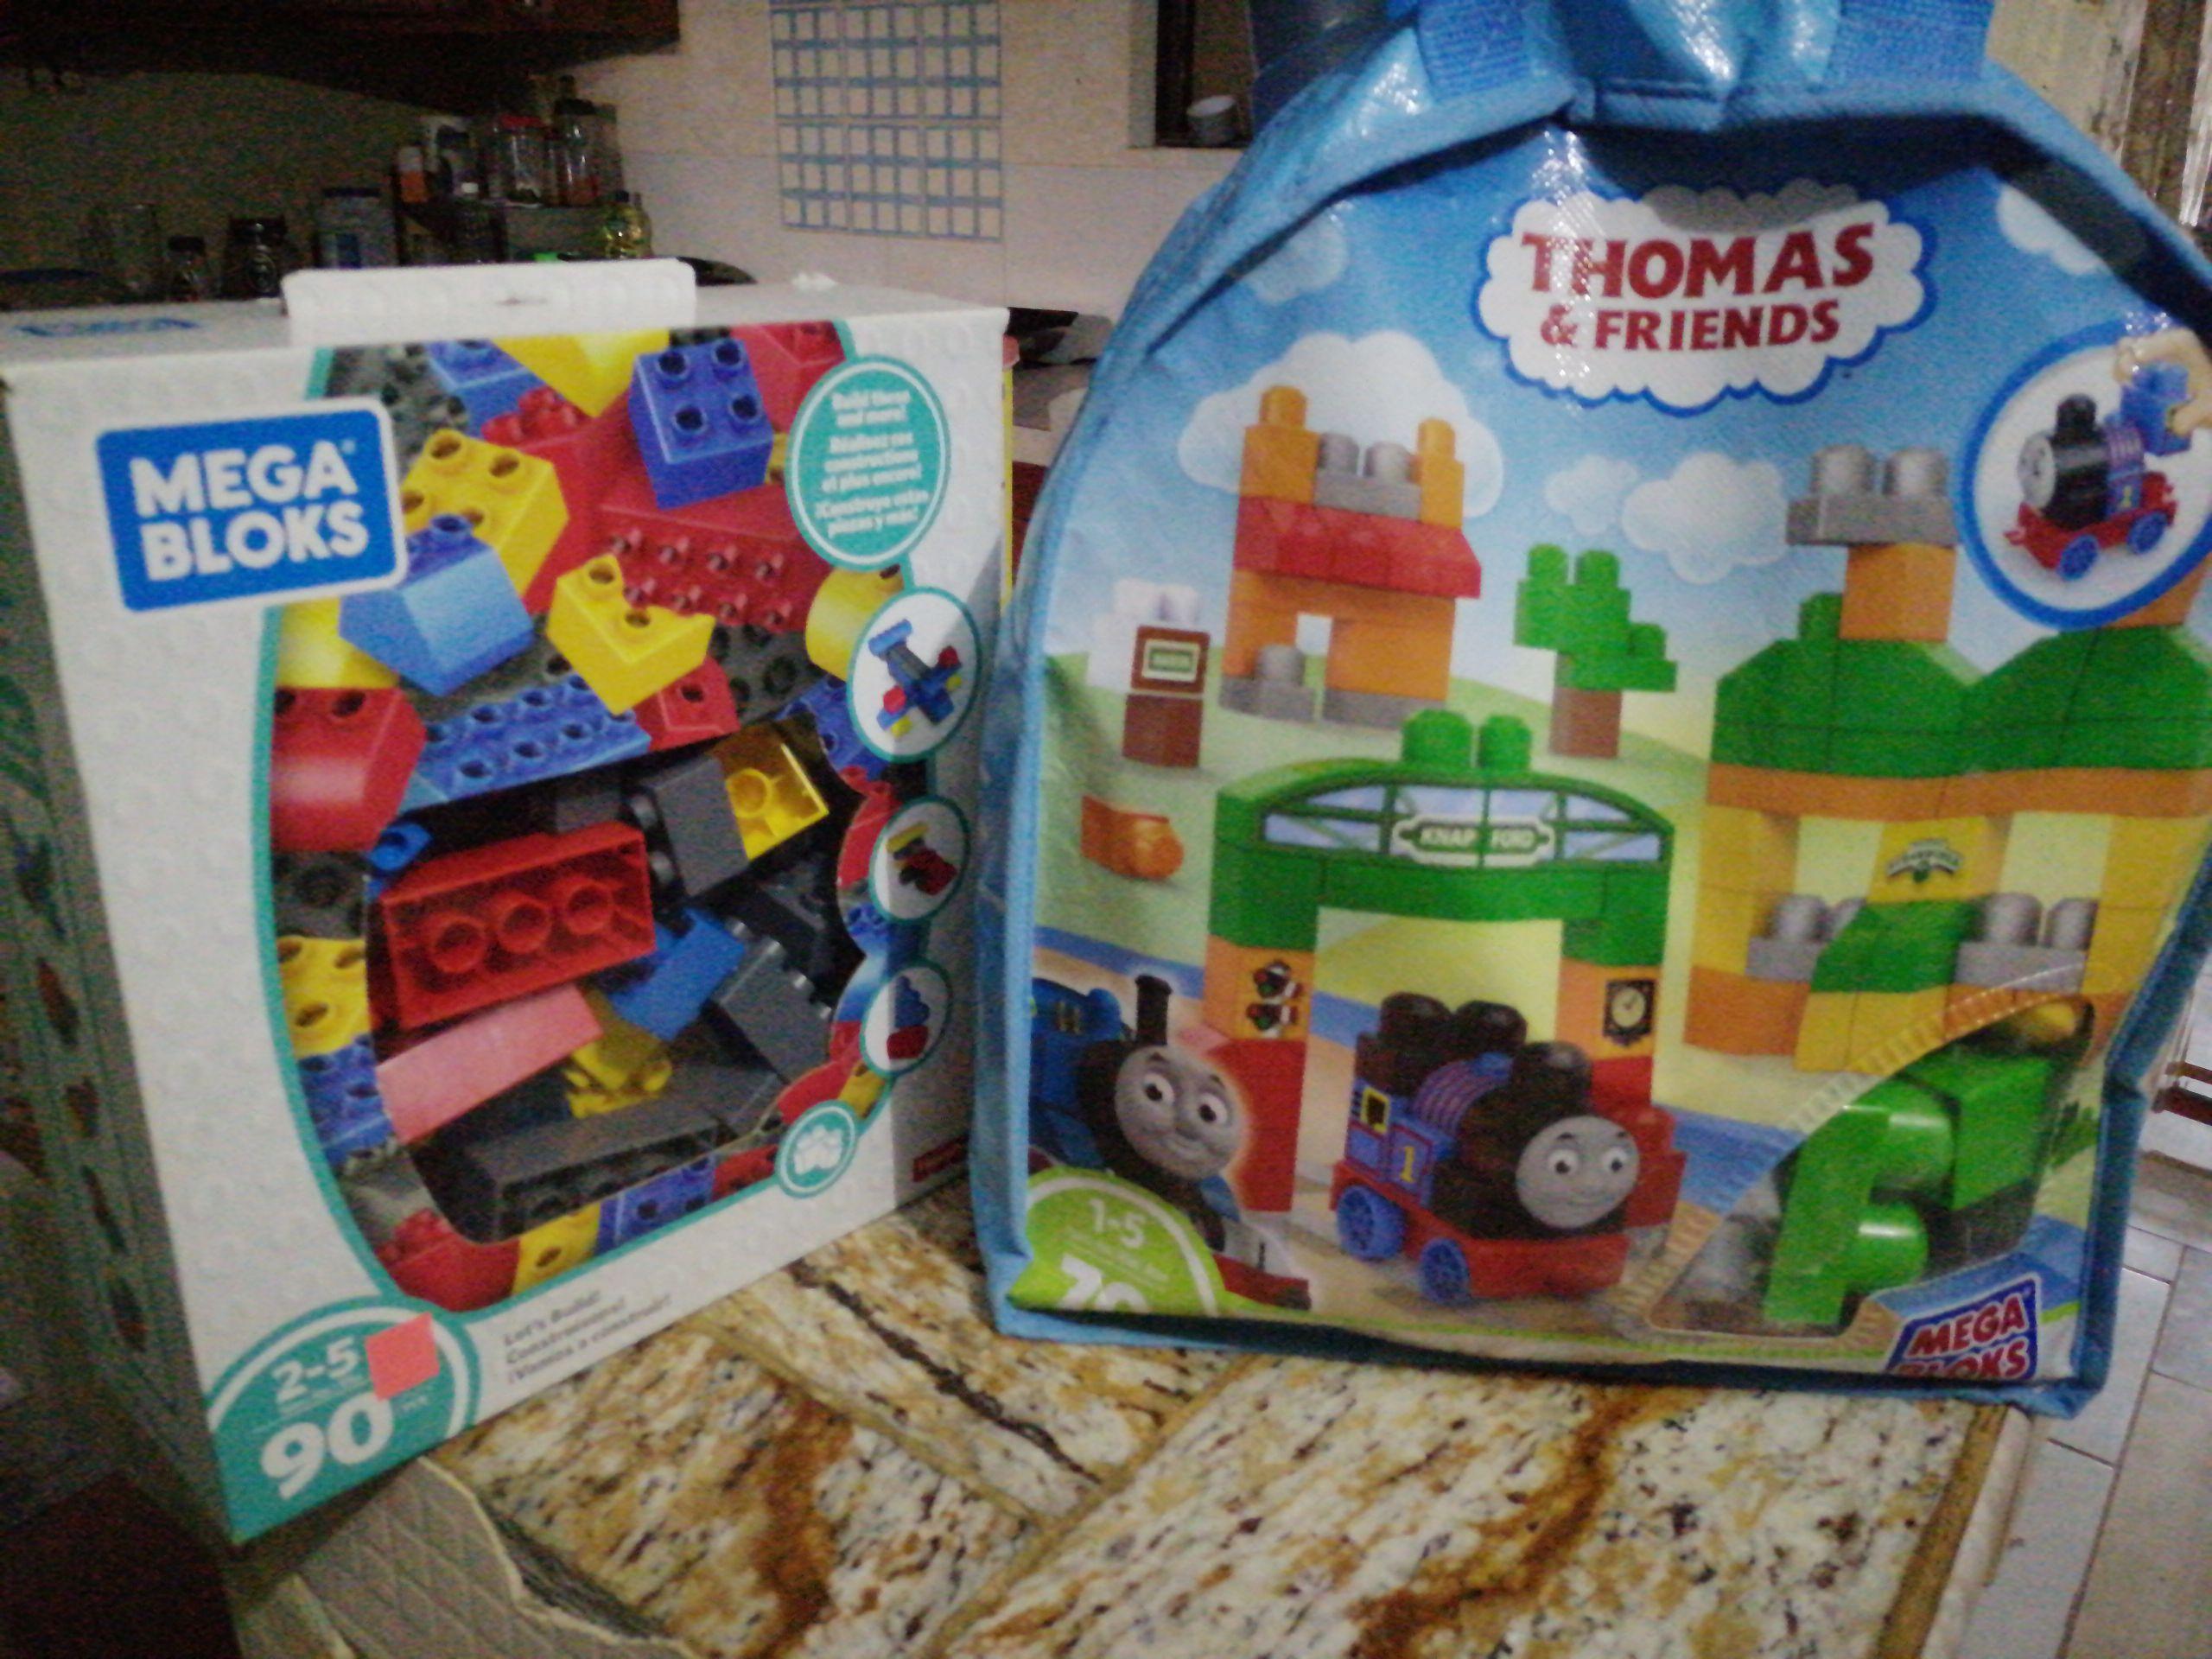 Soriana: Block s y mega bloks